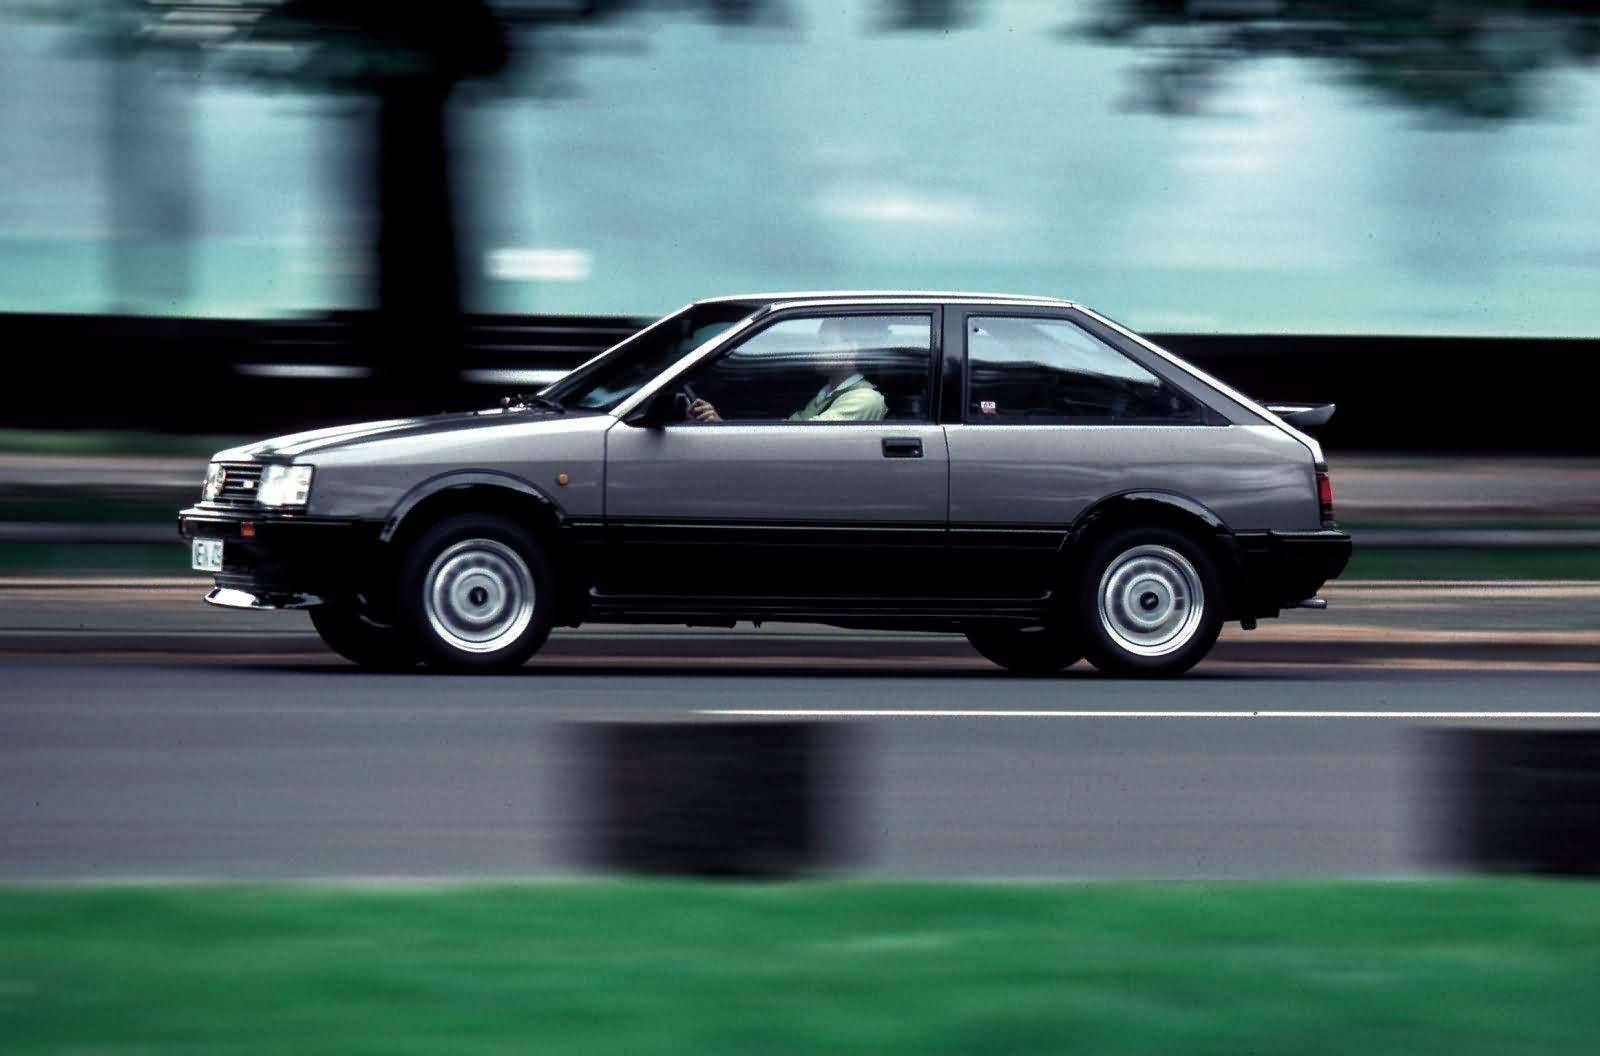 Nissan Cherry Sprint 1985